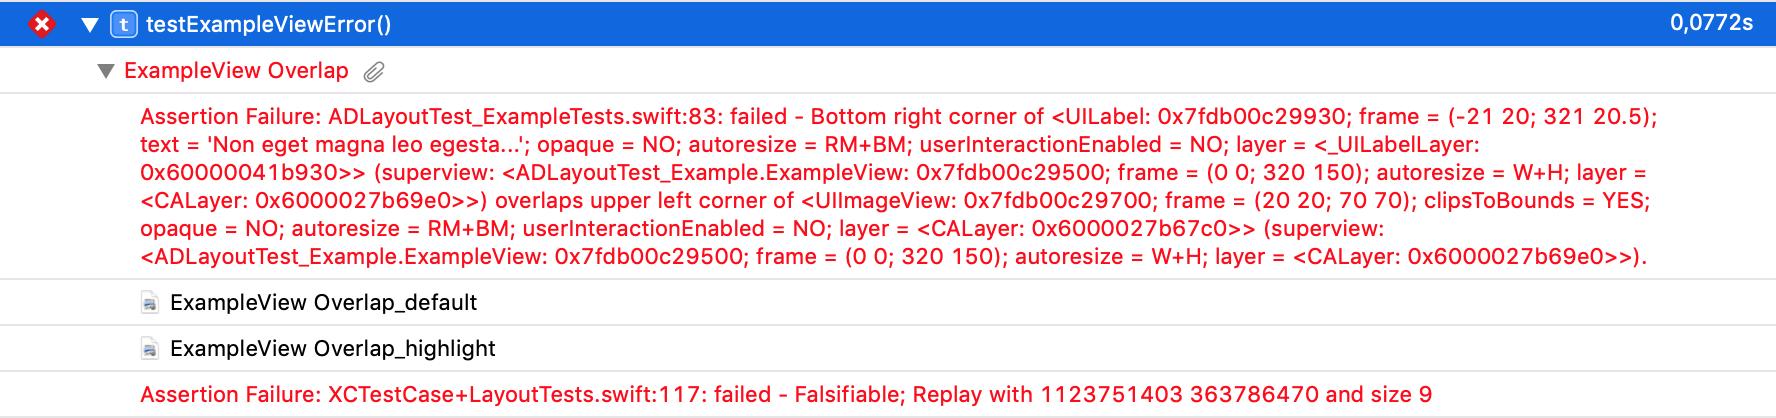 Test Report Failure